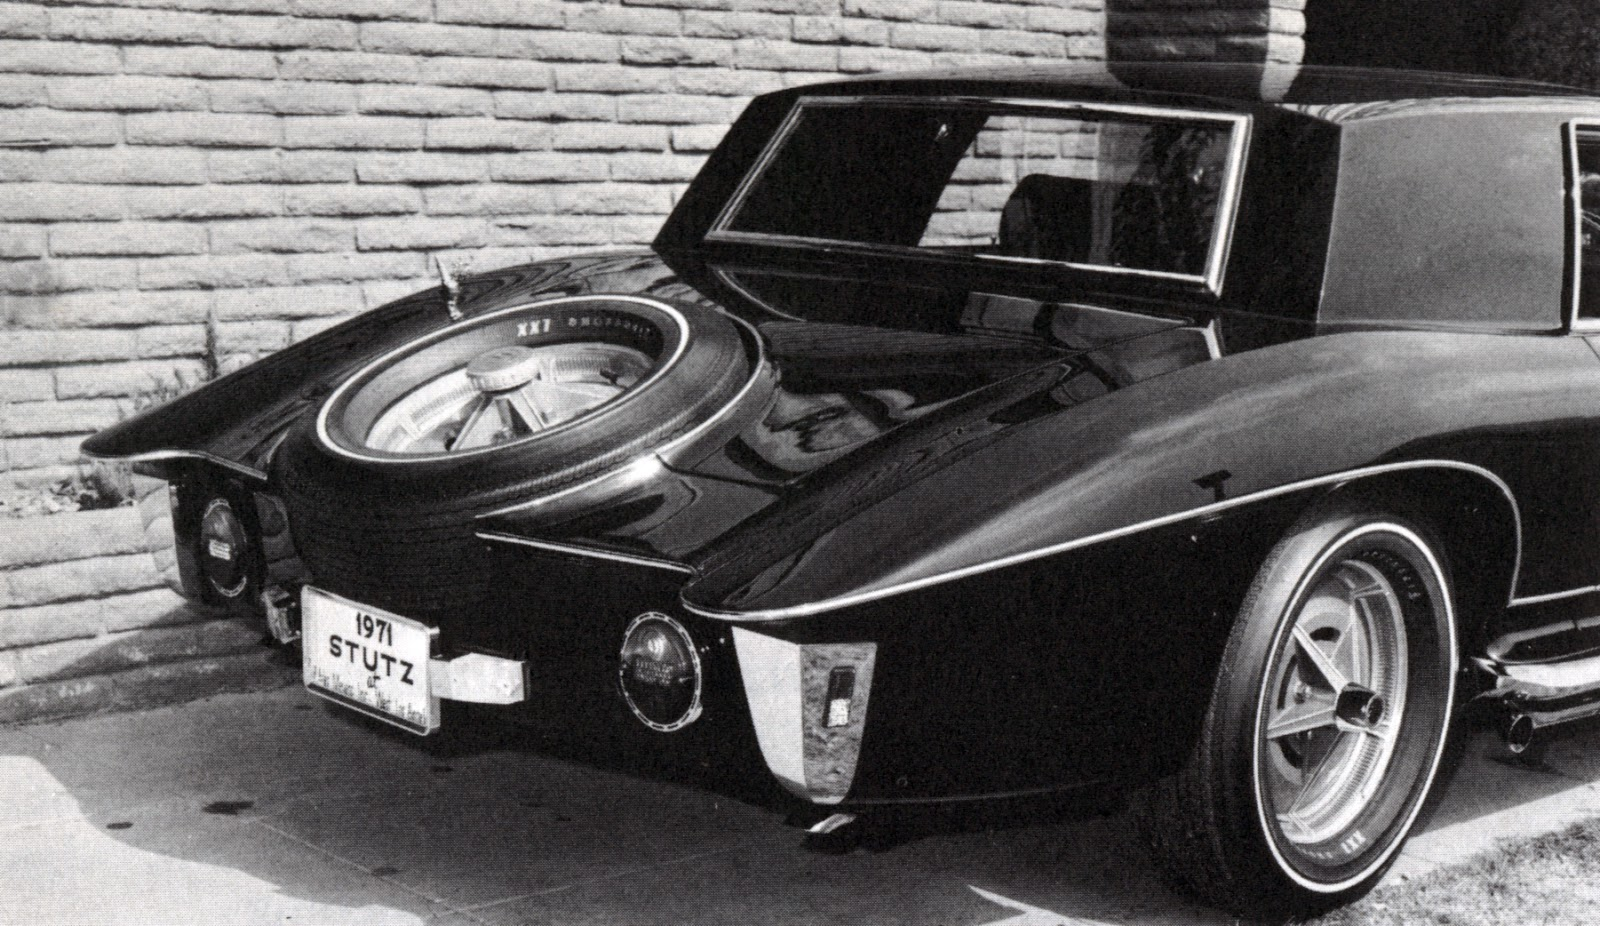 The Stutz Blackhawk 1971 1987 Phscollectorcarworld Lps 1968 Chevelle Fuse Box